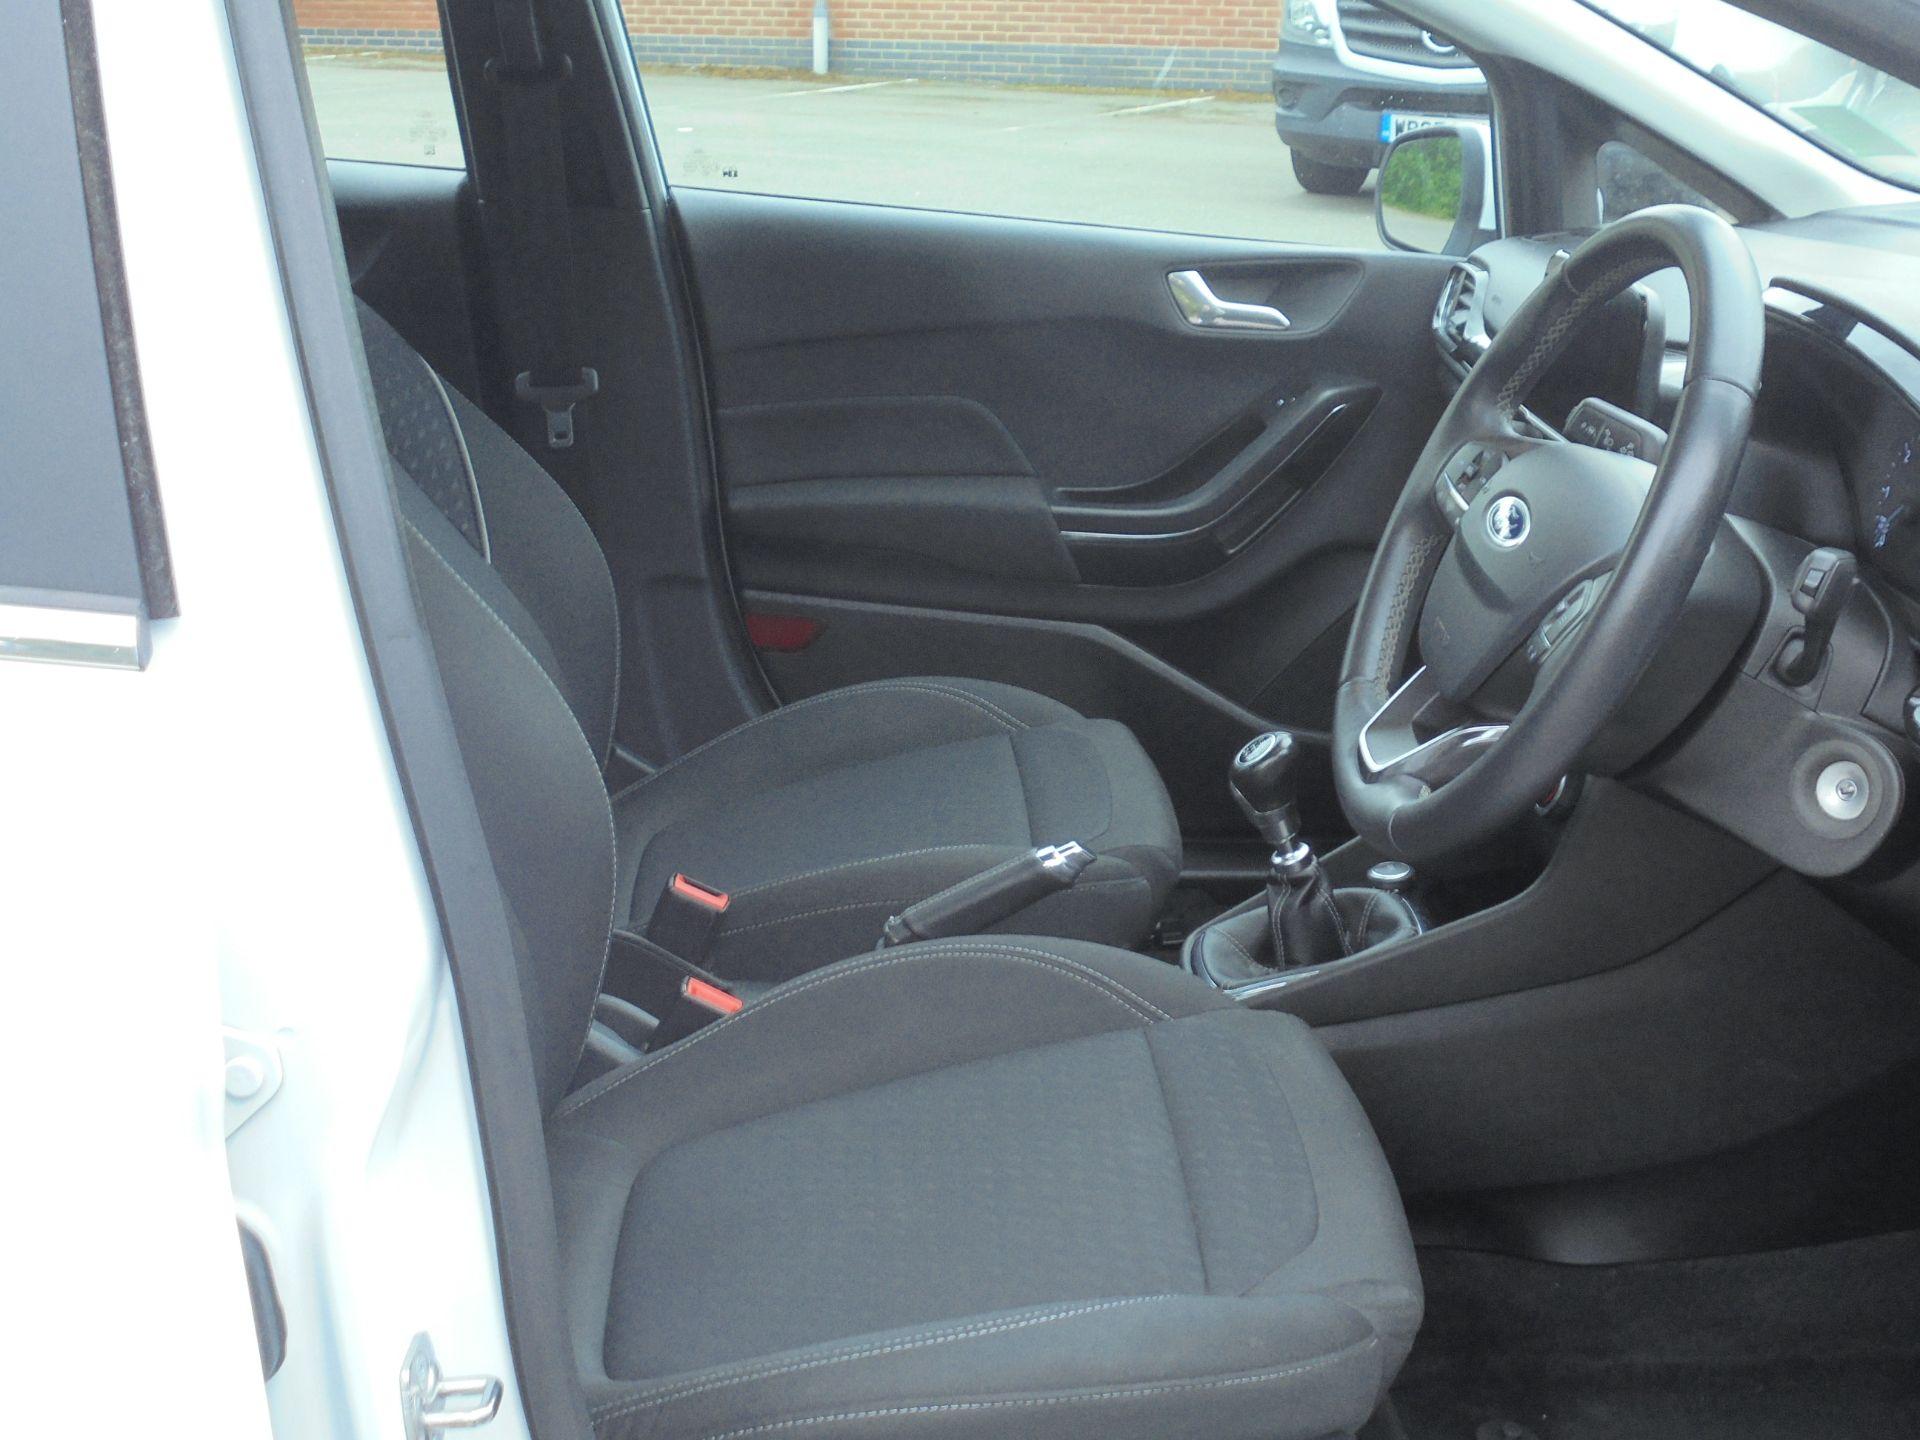 2018 Ford Fiesta 1.5 Tdci Zetec 5Dr (FD18WHU) Image 12